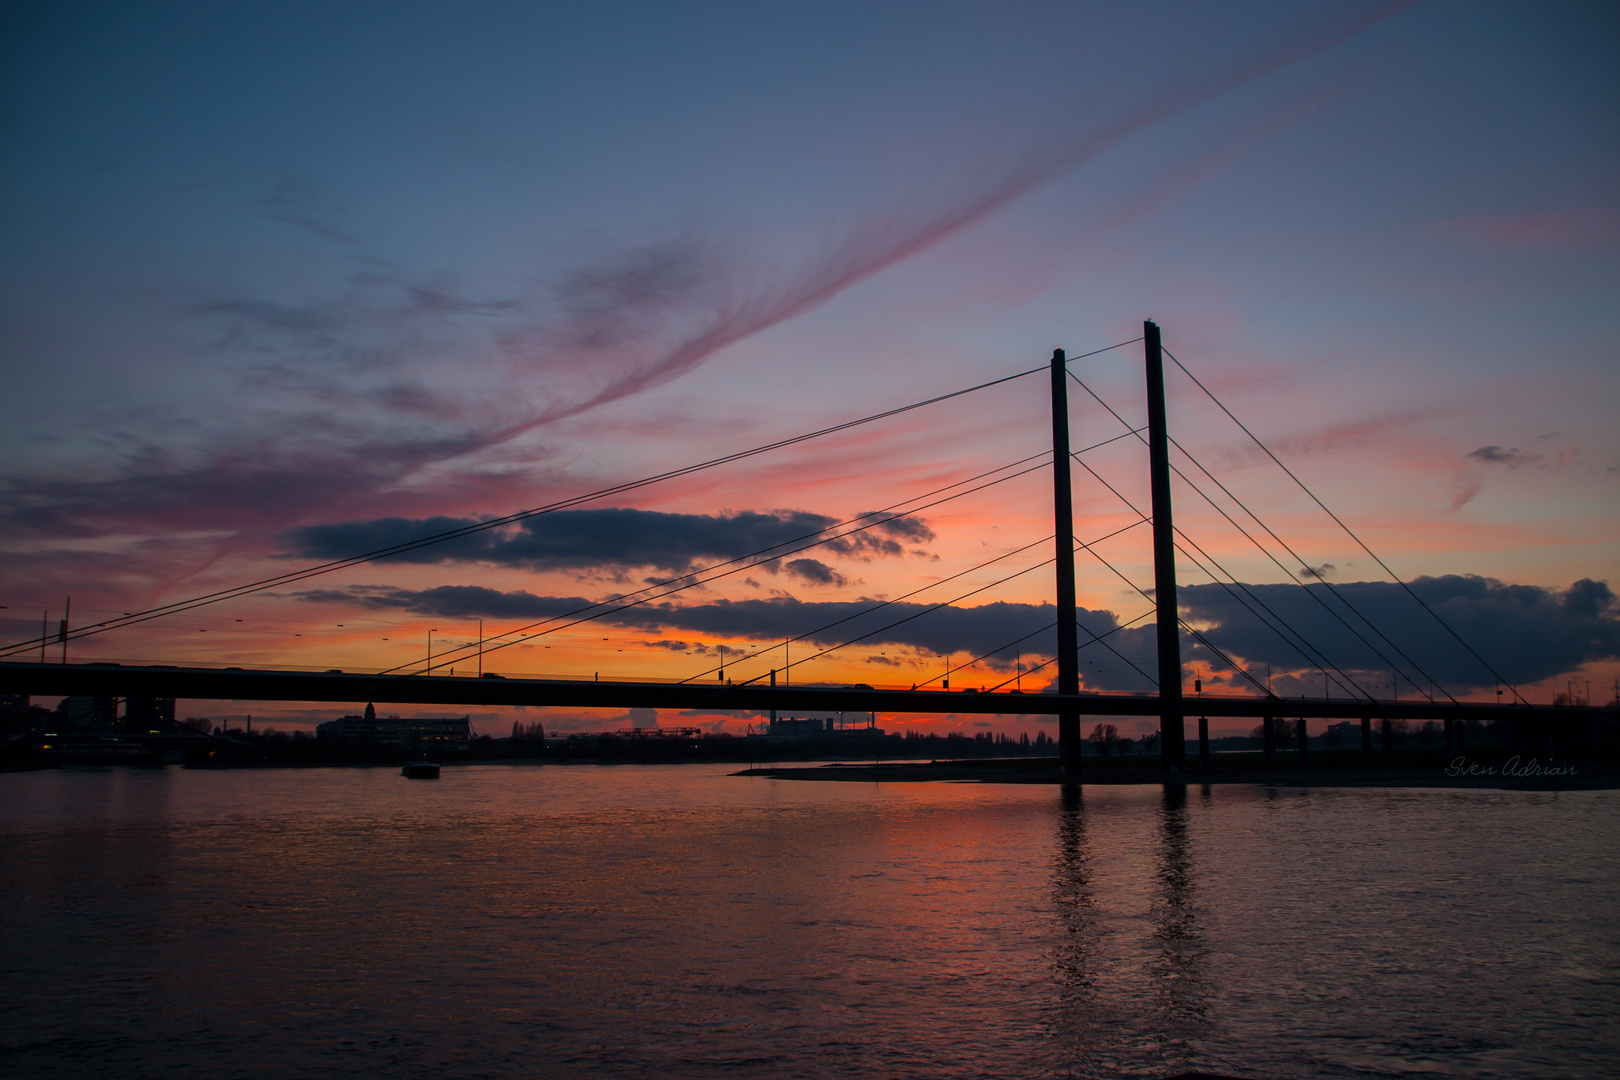 Sonnenuntergang an der Rheinkniebrücke